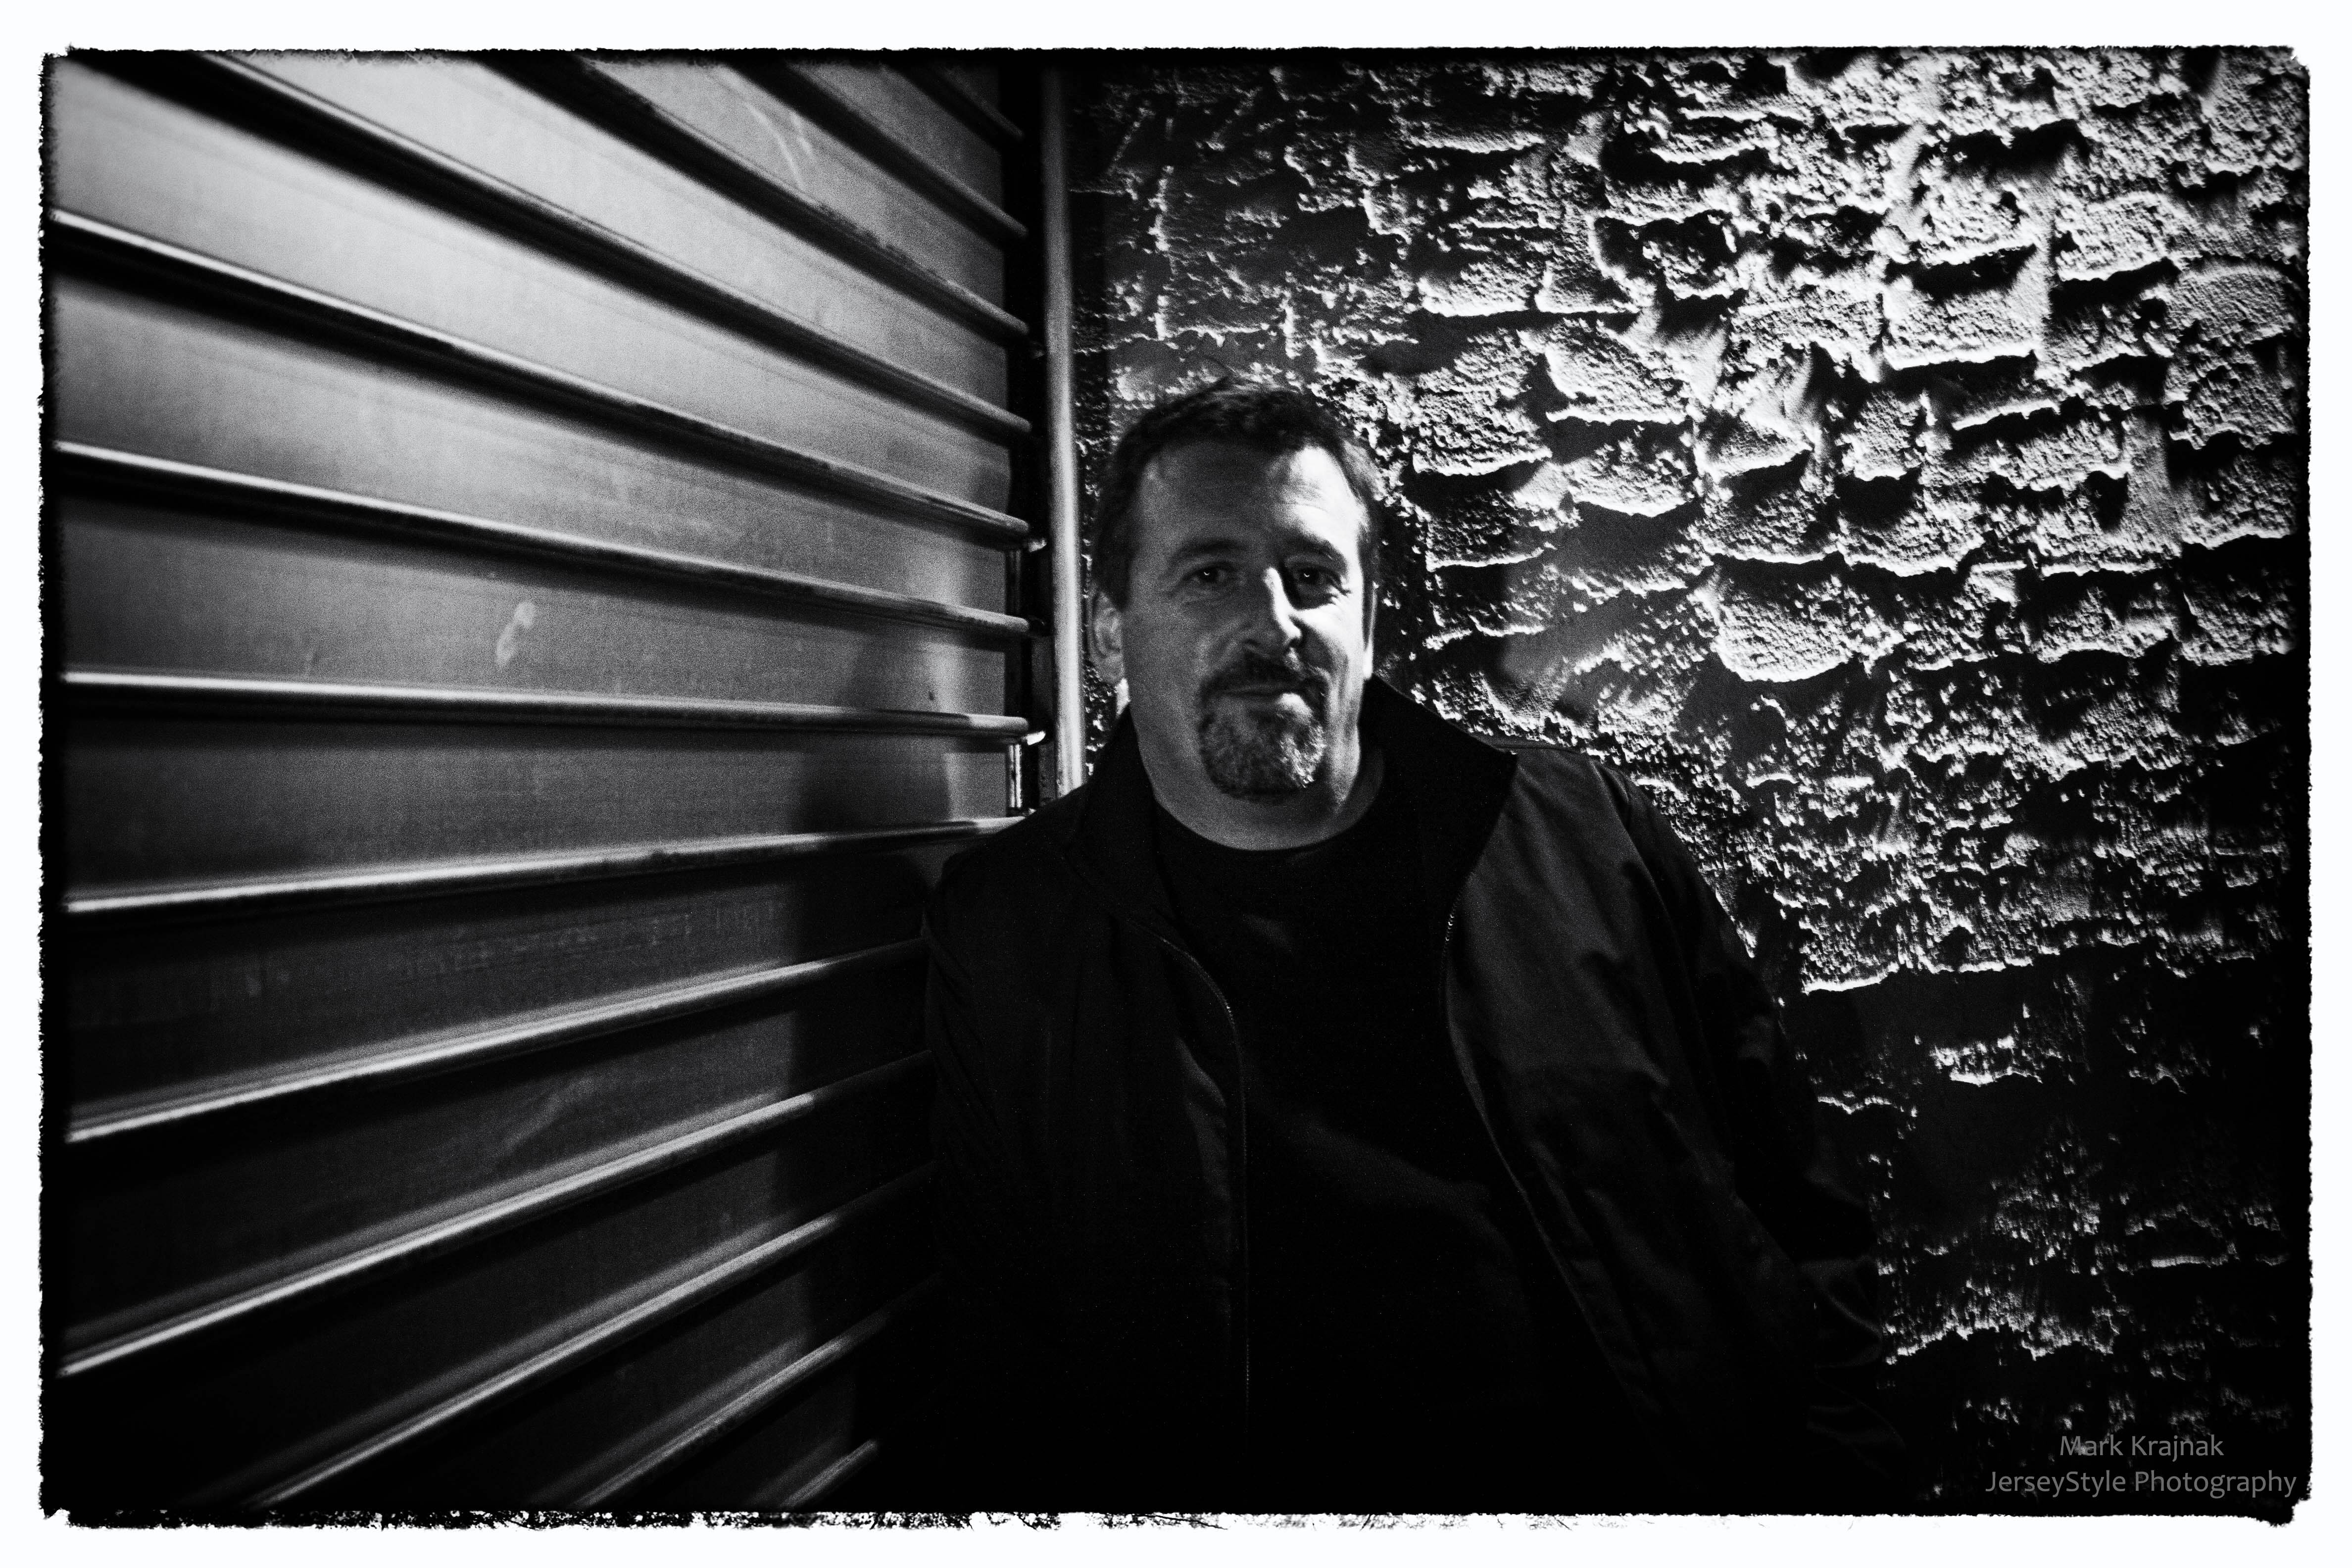 Andrew Nette_Mark Krajnak_JerseyStyle Photography_102014_8100